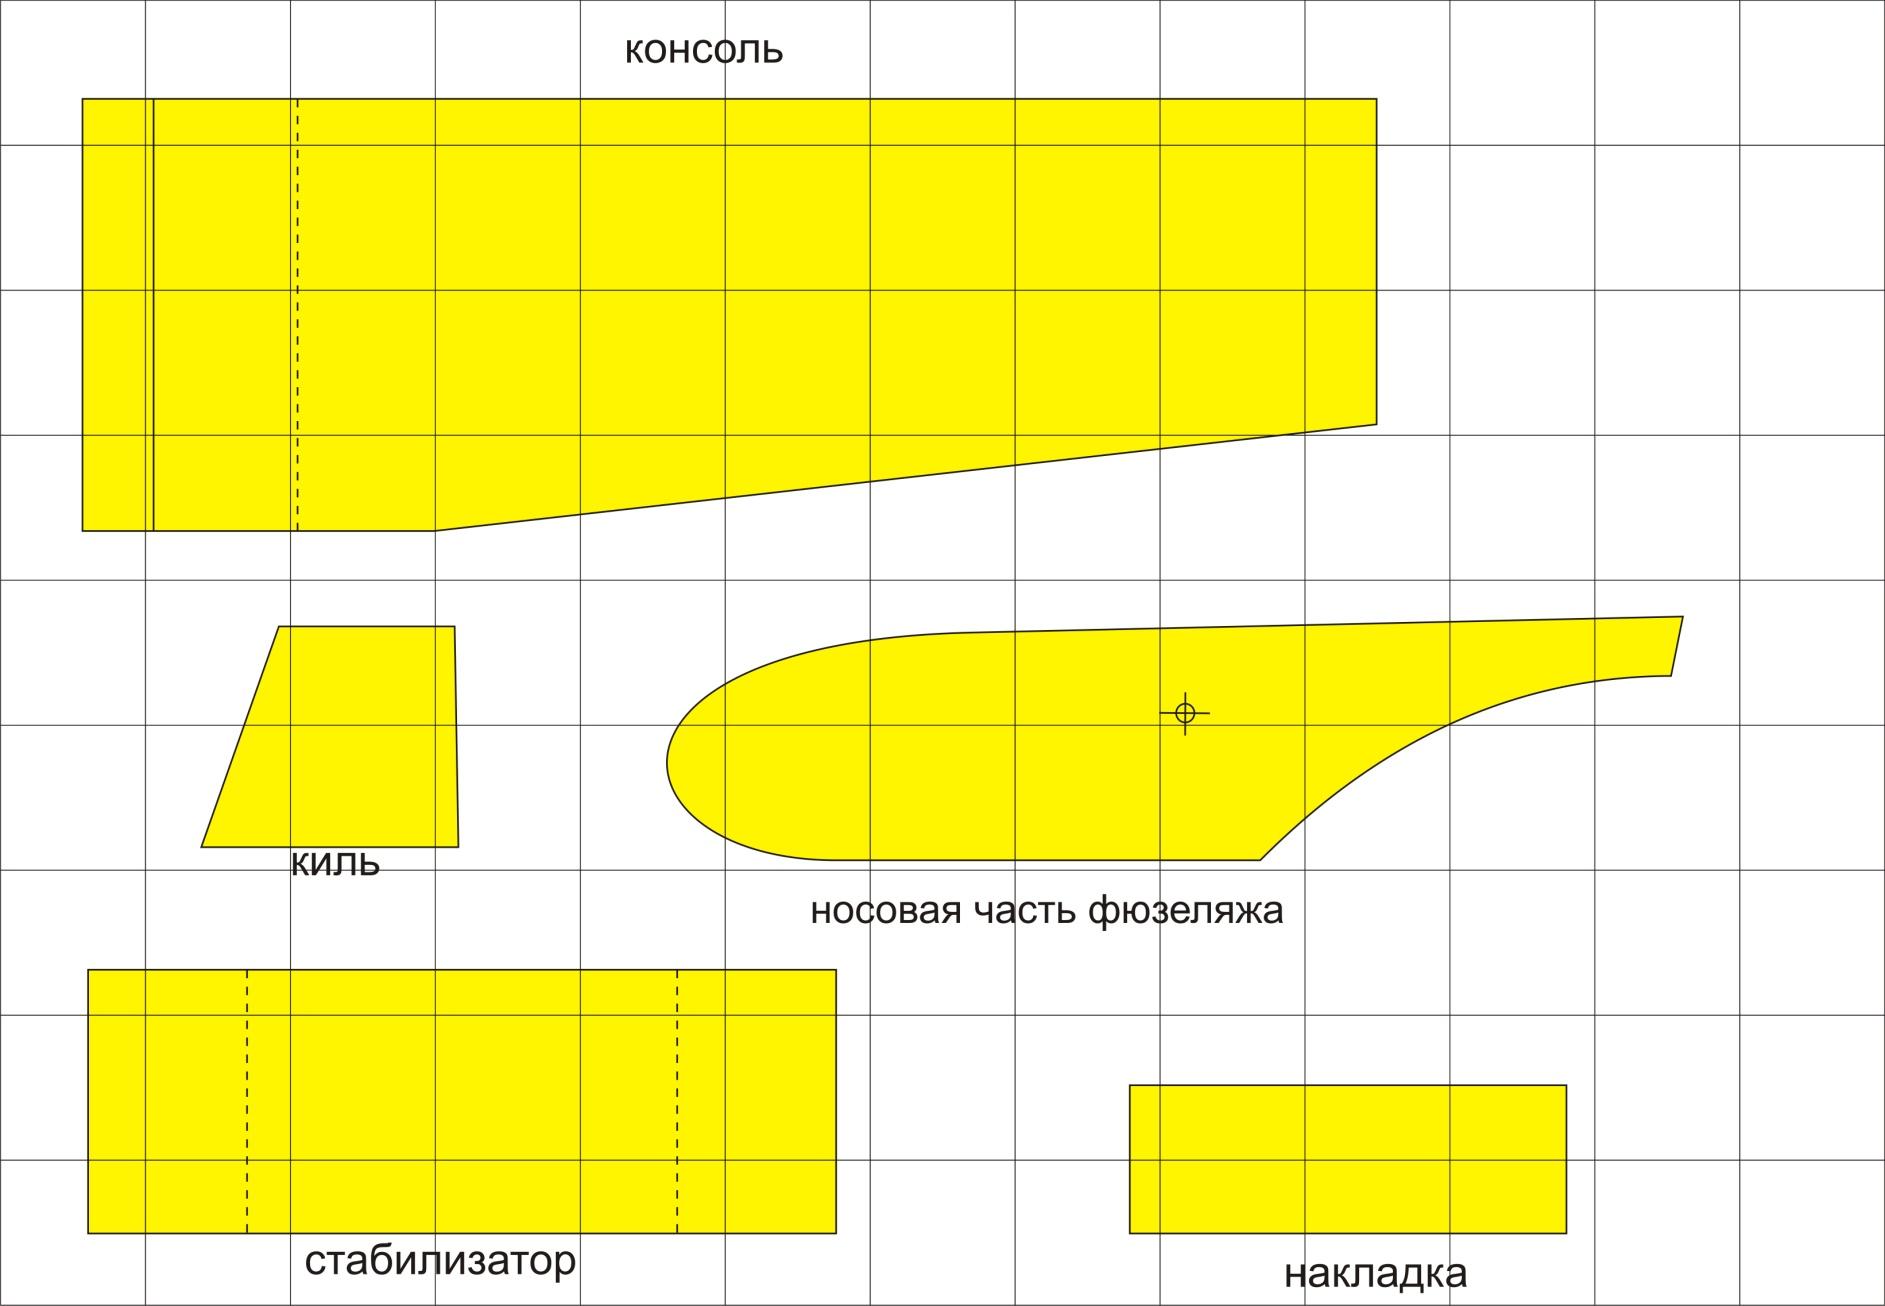 H:\АРХИВ\АВИА\Авиамоделизм\Бумажные модели\металки\шаблоны юниор.jpg